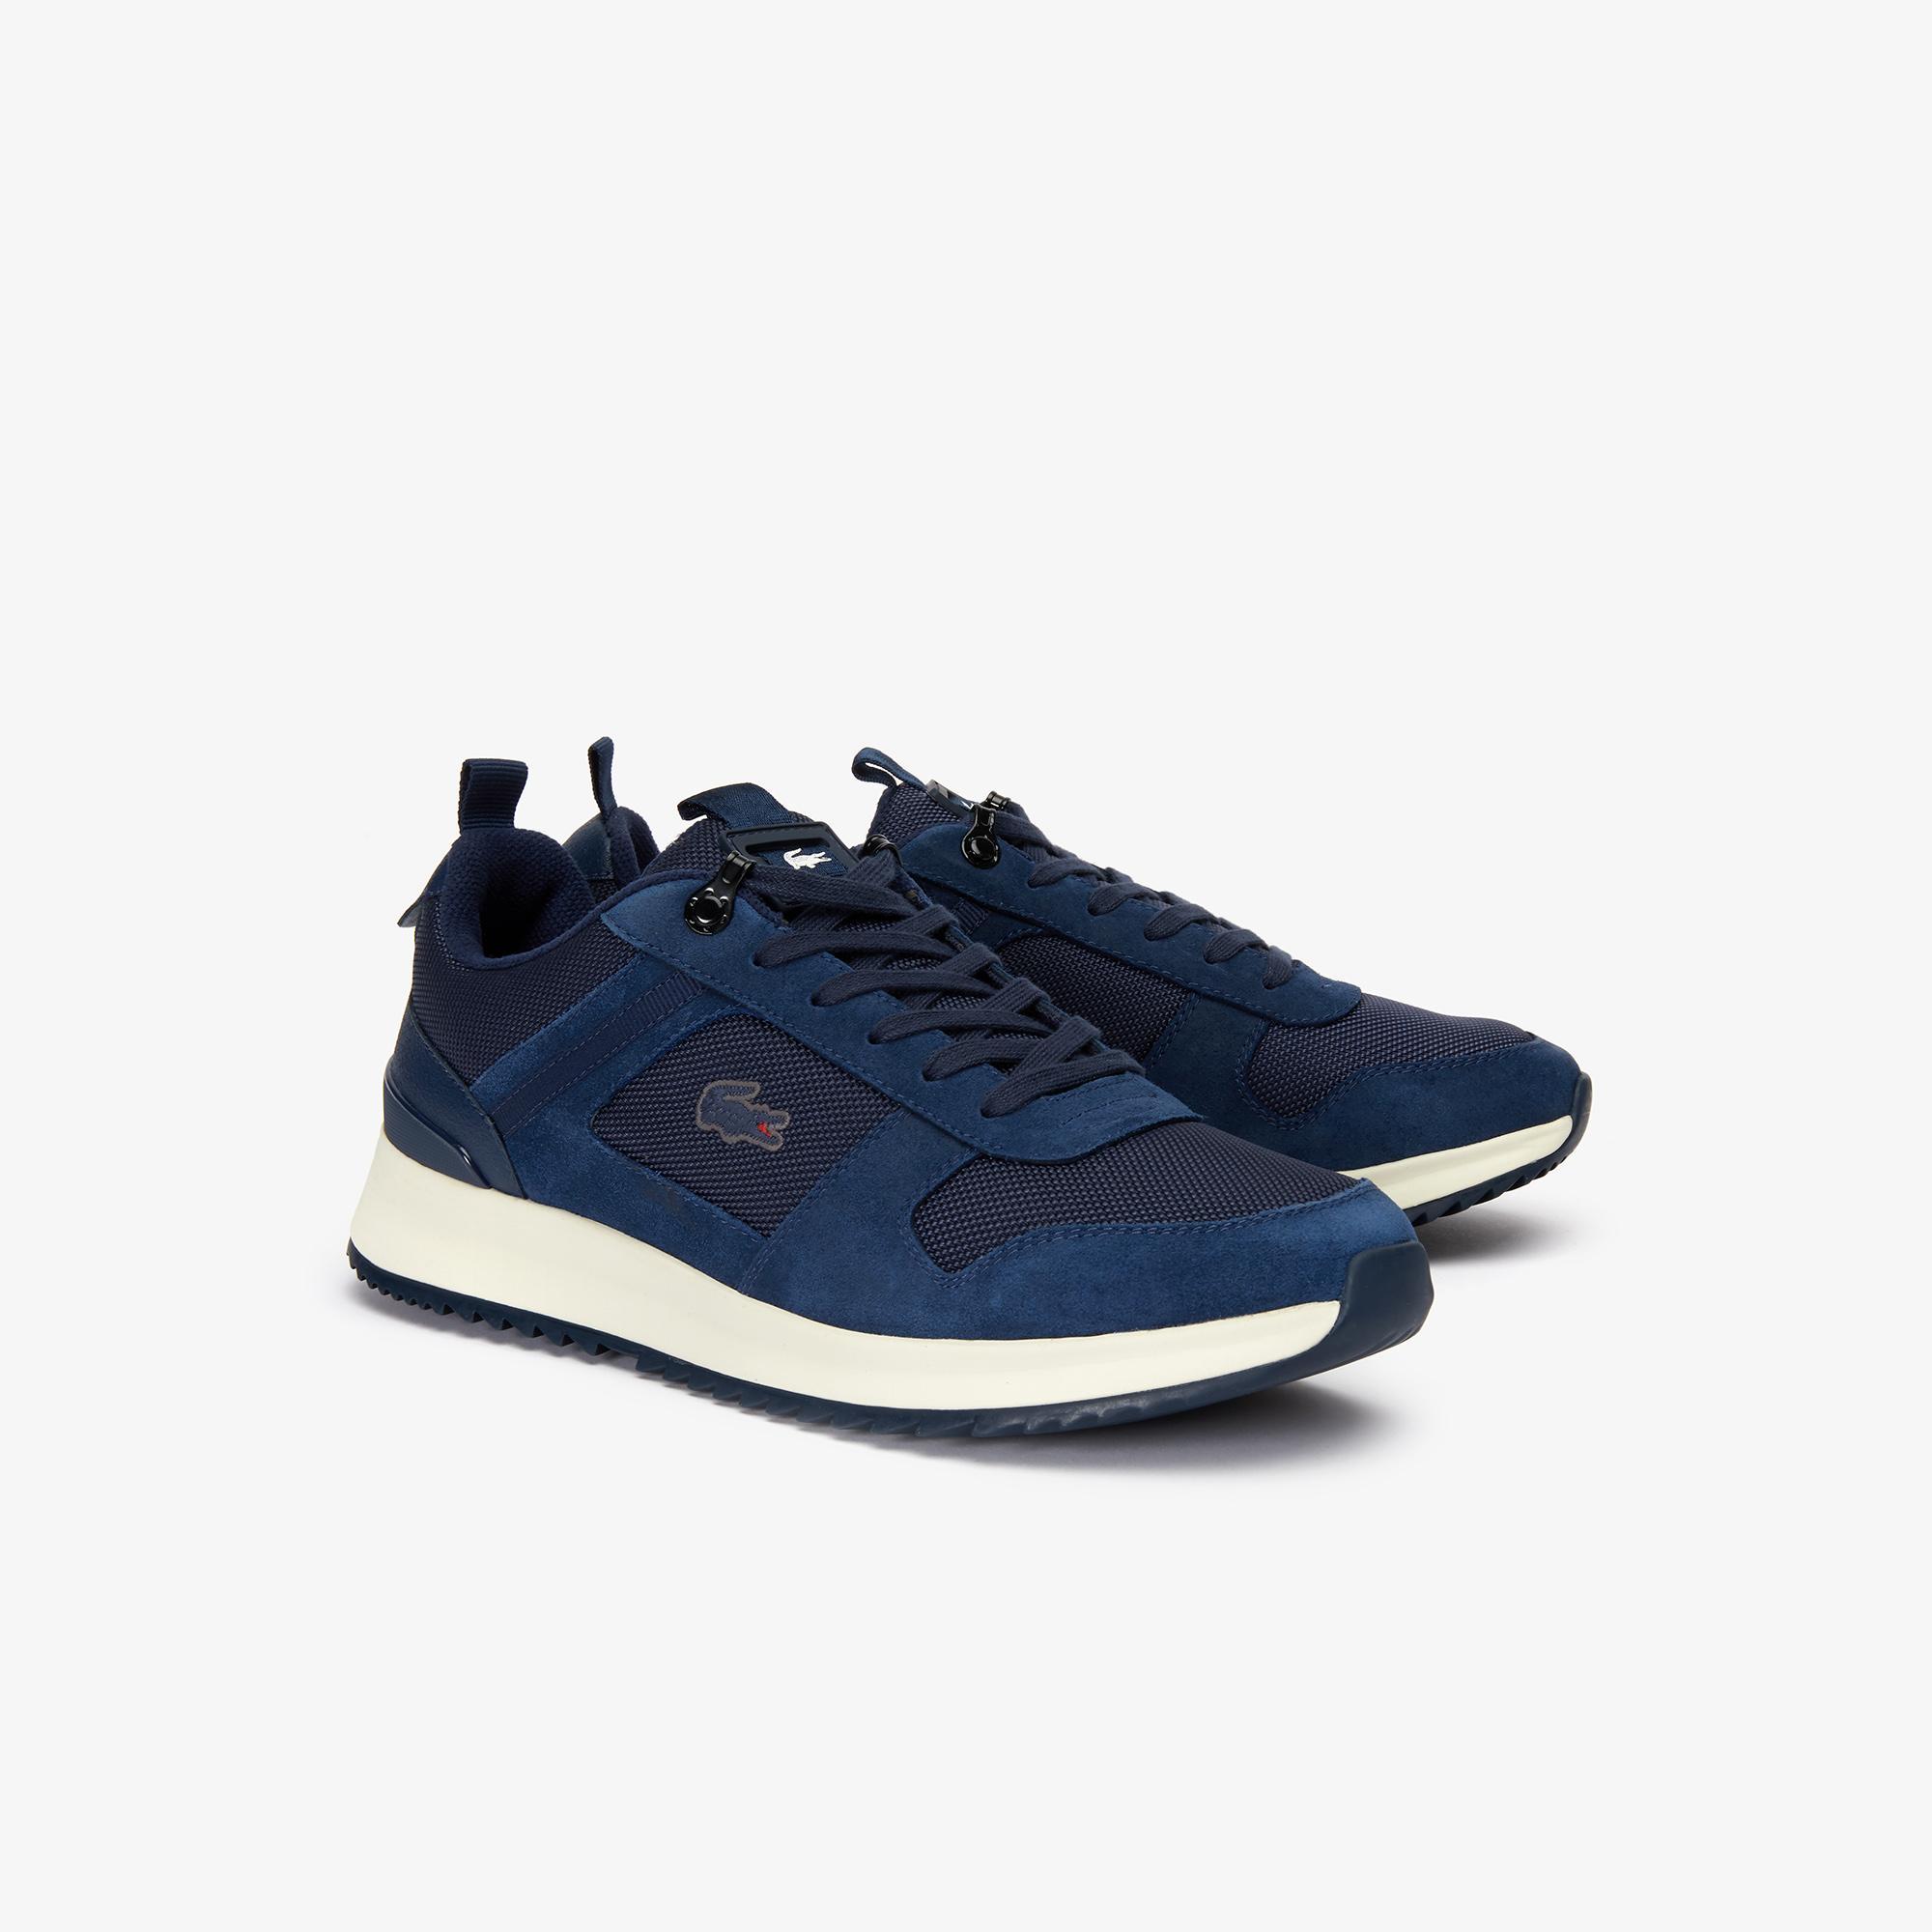 Lacoste Men's Joggeur 2.0 319 1 SMA Sneakers